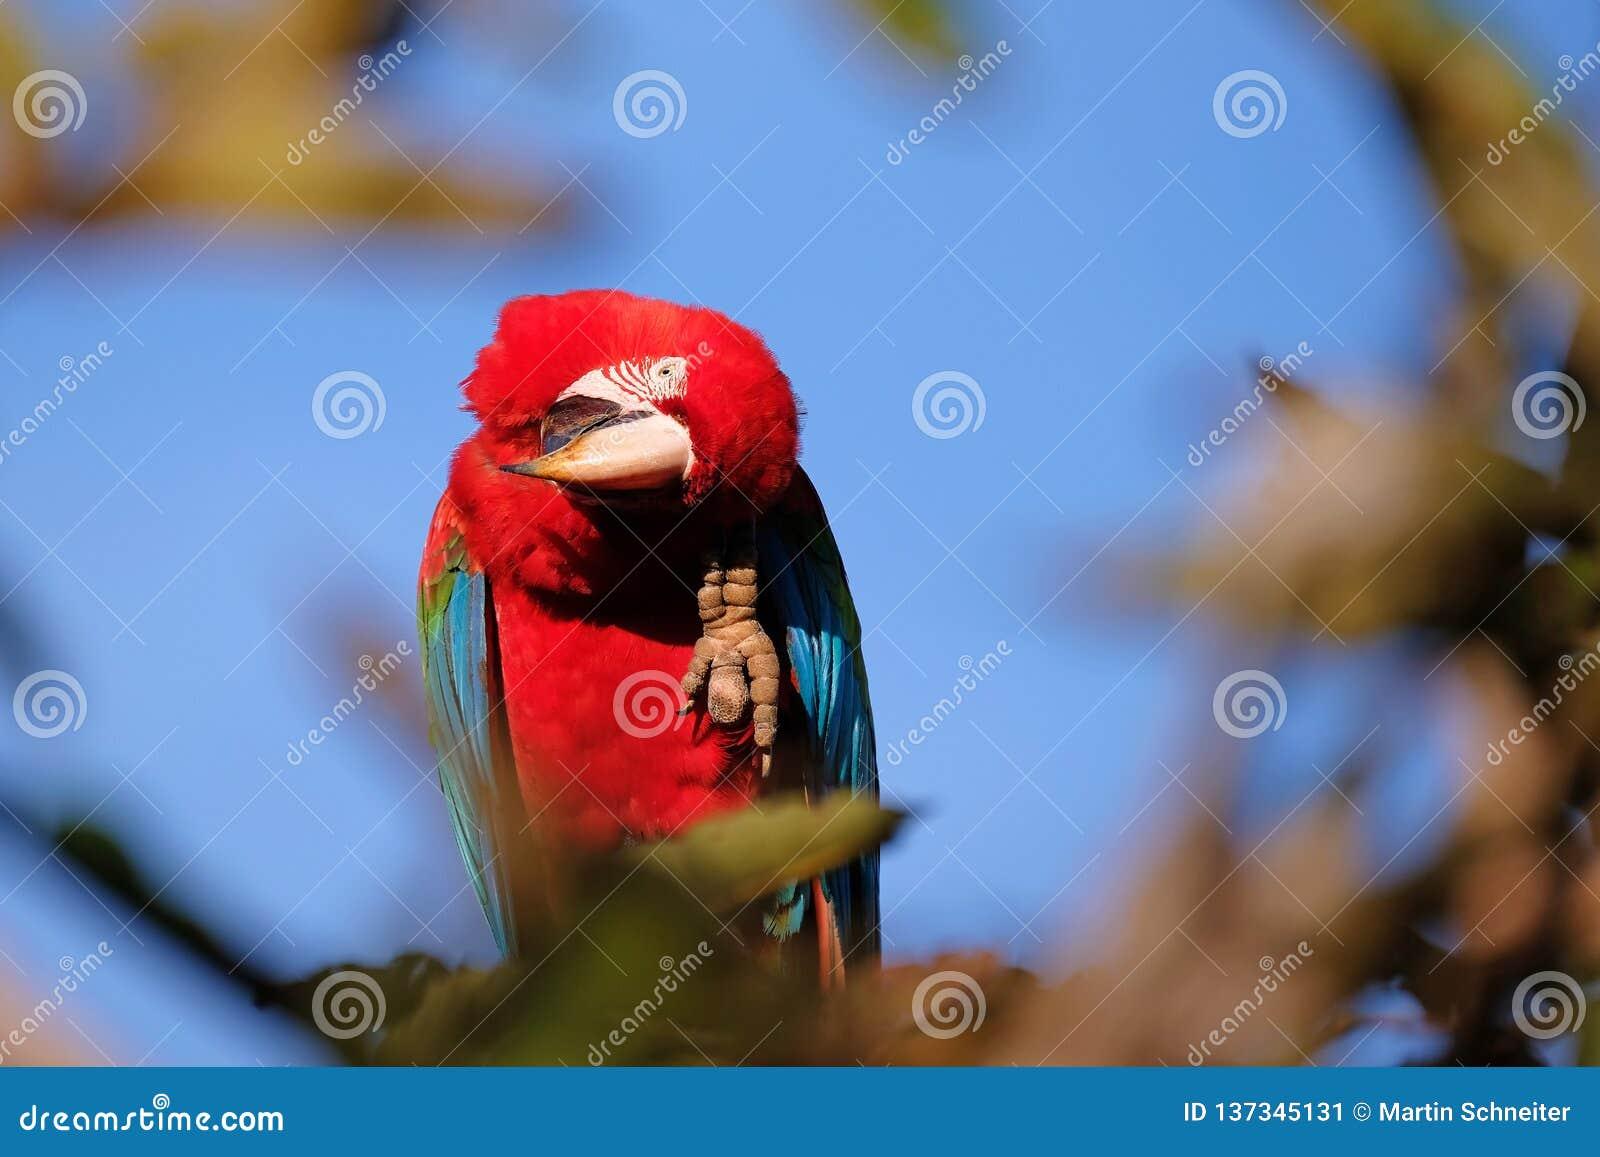 Arara vermelha e verde, Ara Chloropterus, Buraco DAS Araras, perto do bonito, Pantanal, Brasil